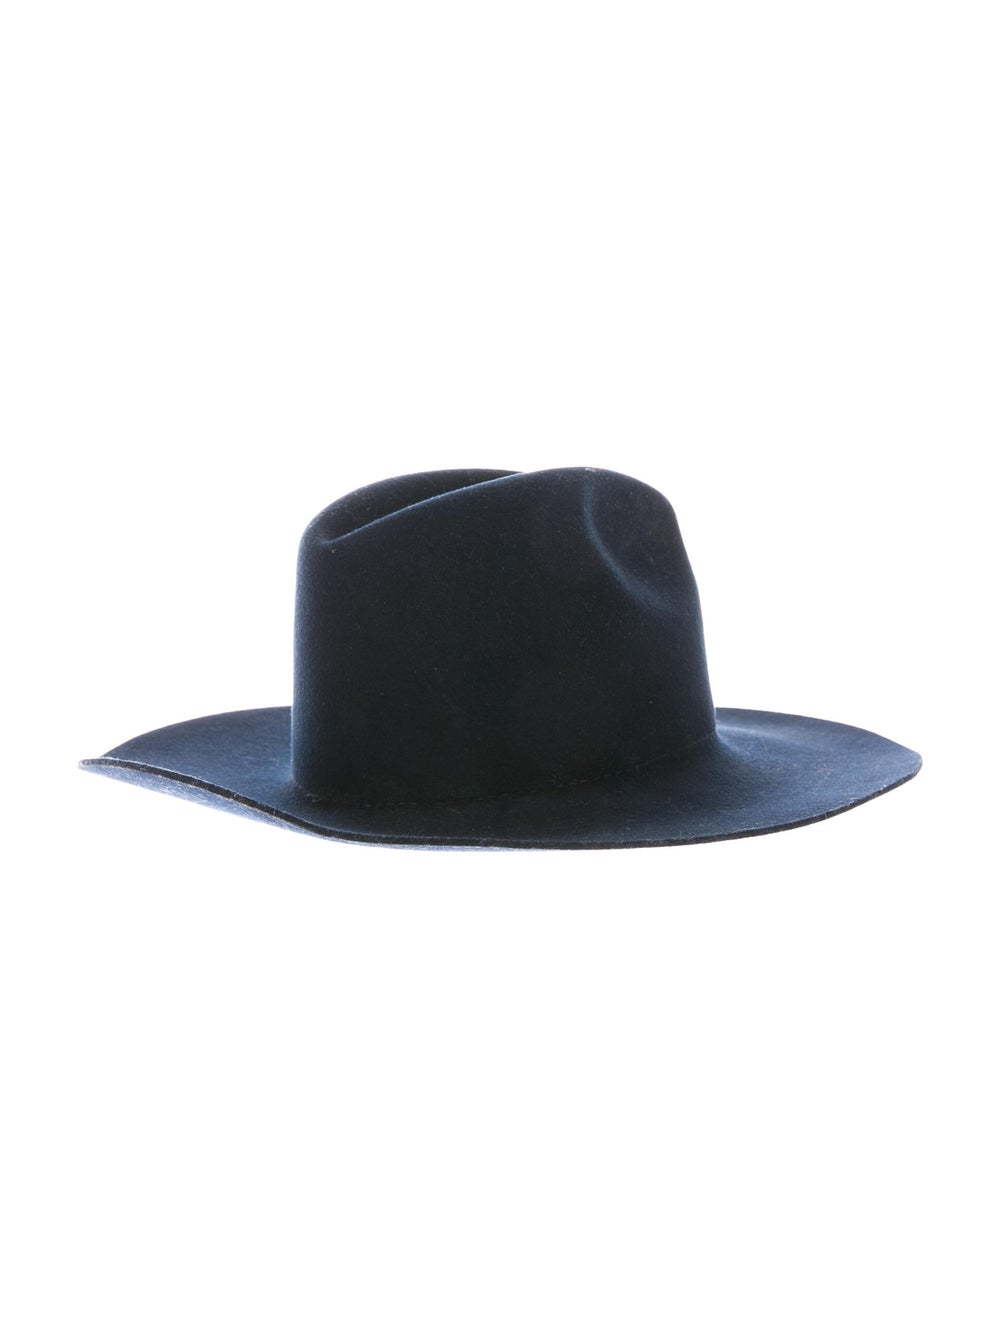 Janessa Leone Wool Fedora Hat Navy - image 2